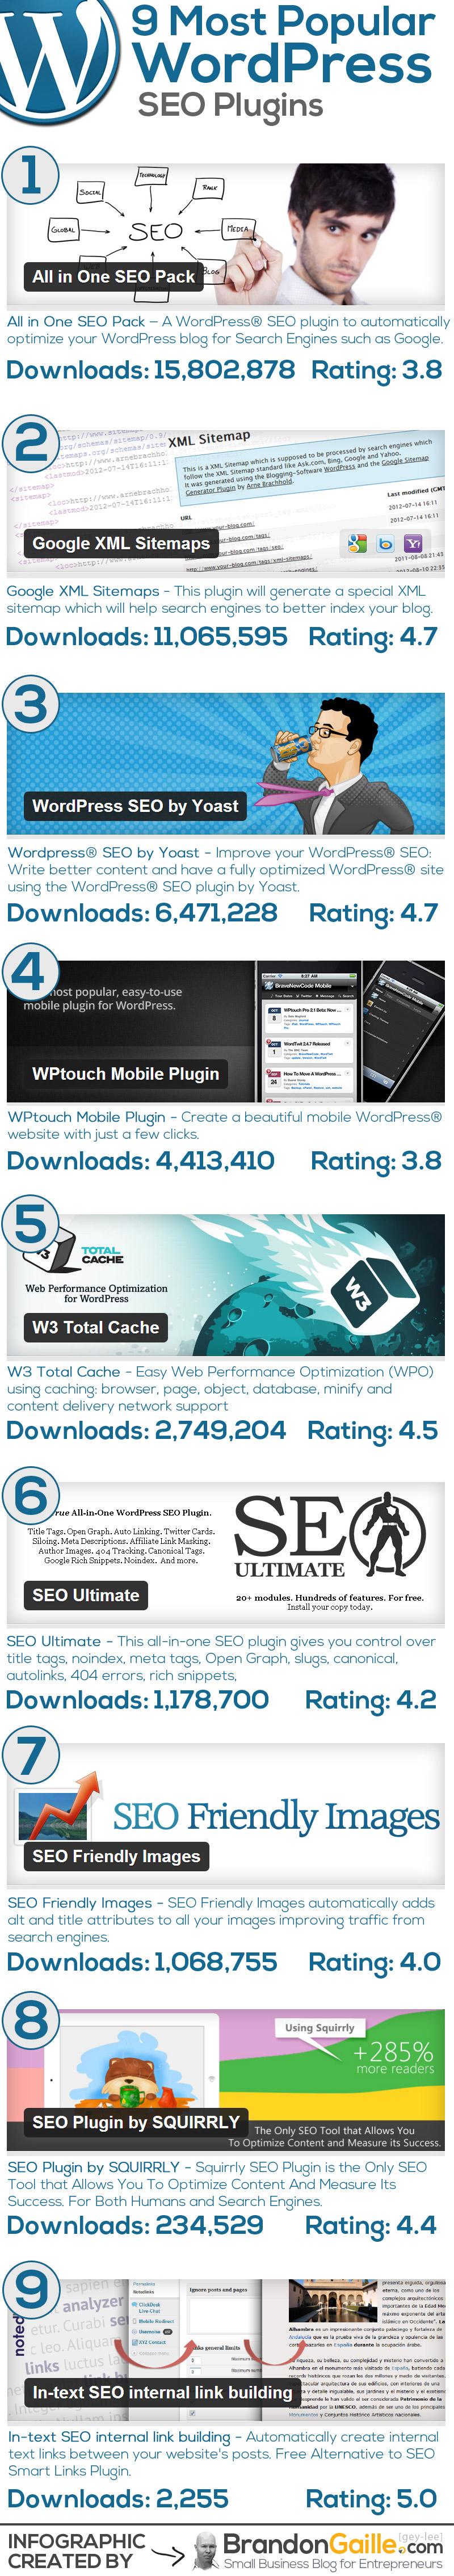 Best-Wordpress-SEO-Plugins-Infographic